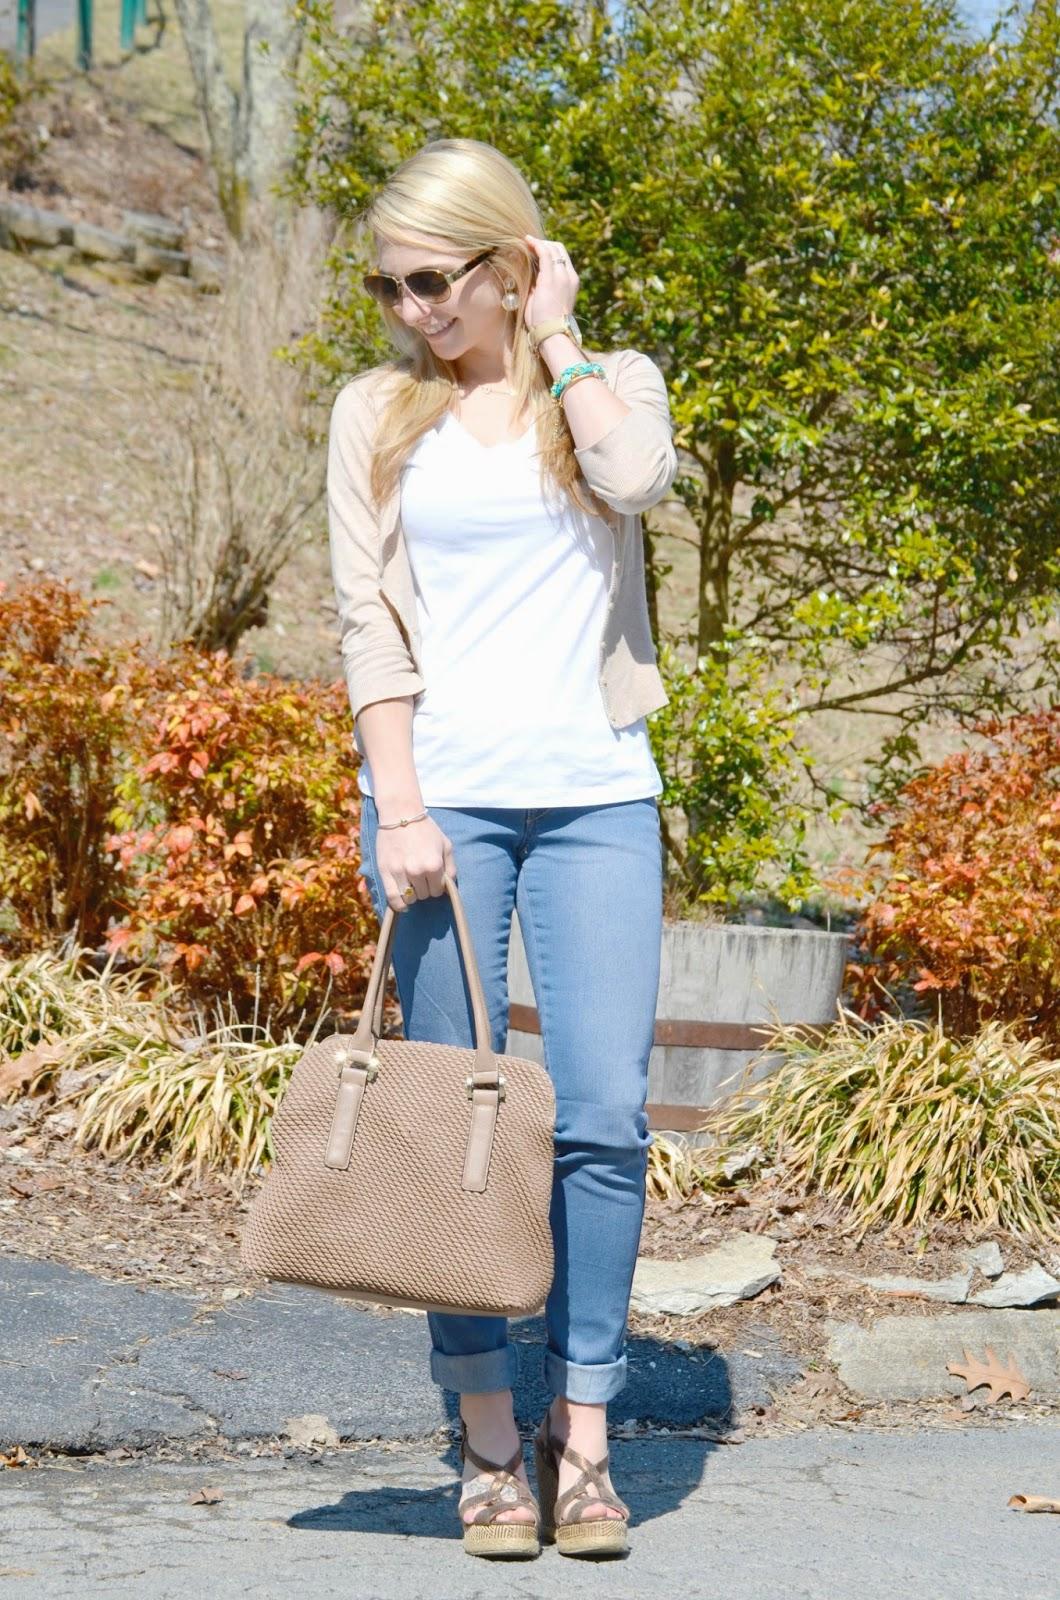 Fashion outfit accesorizing plain white tee